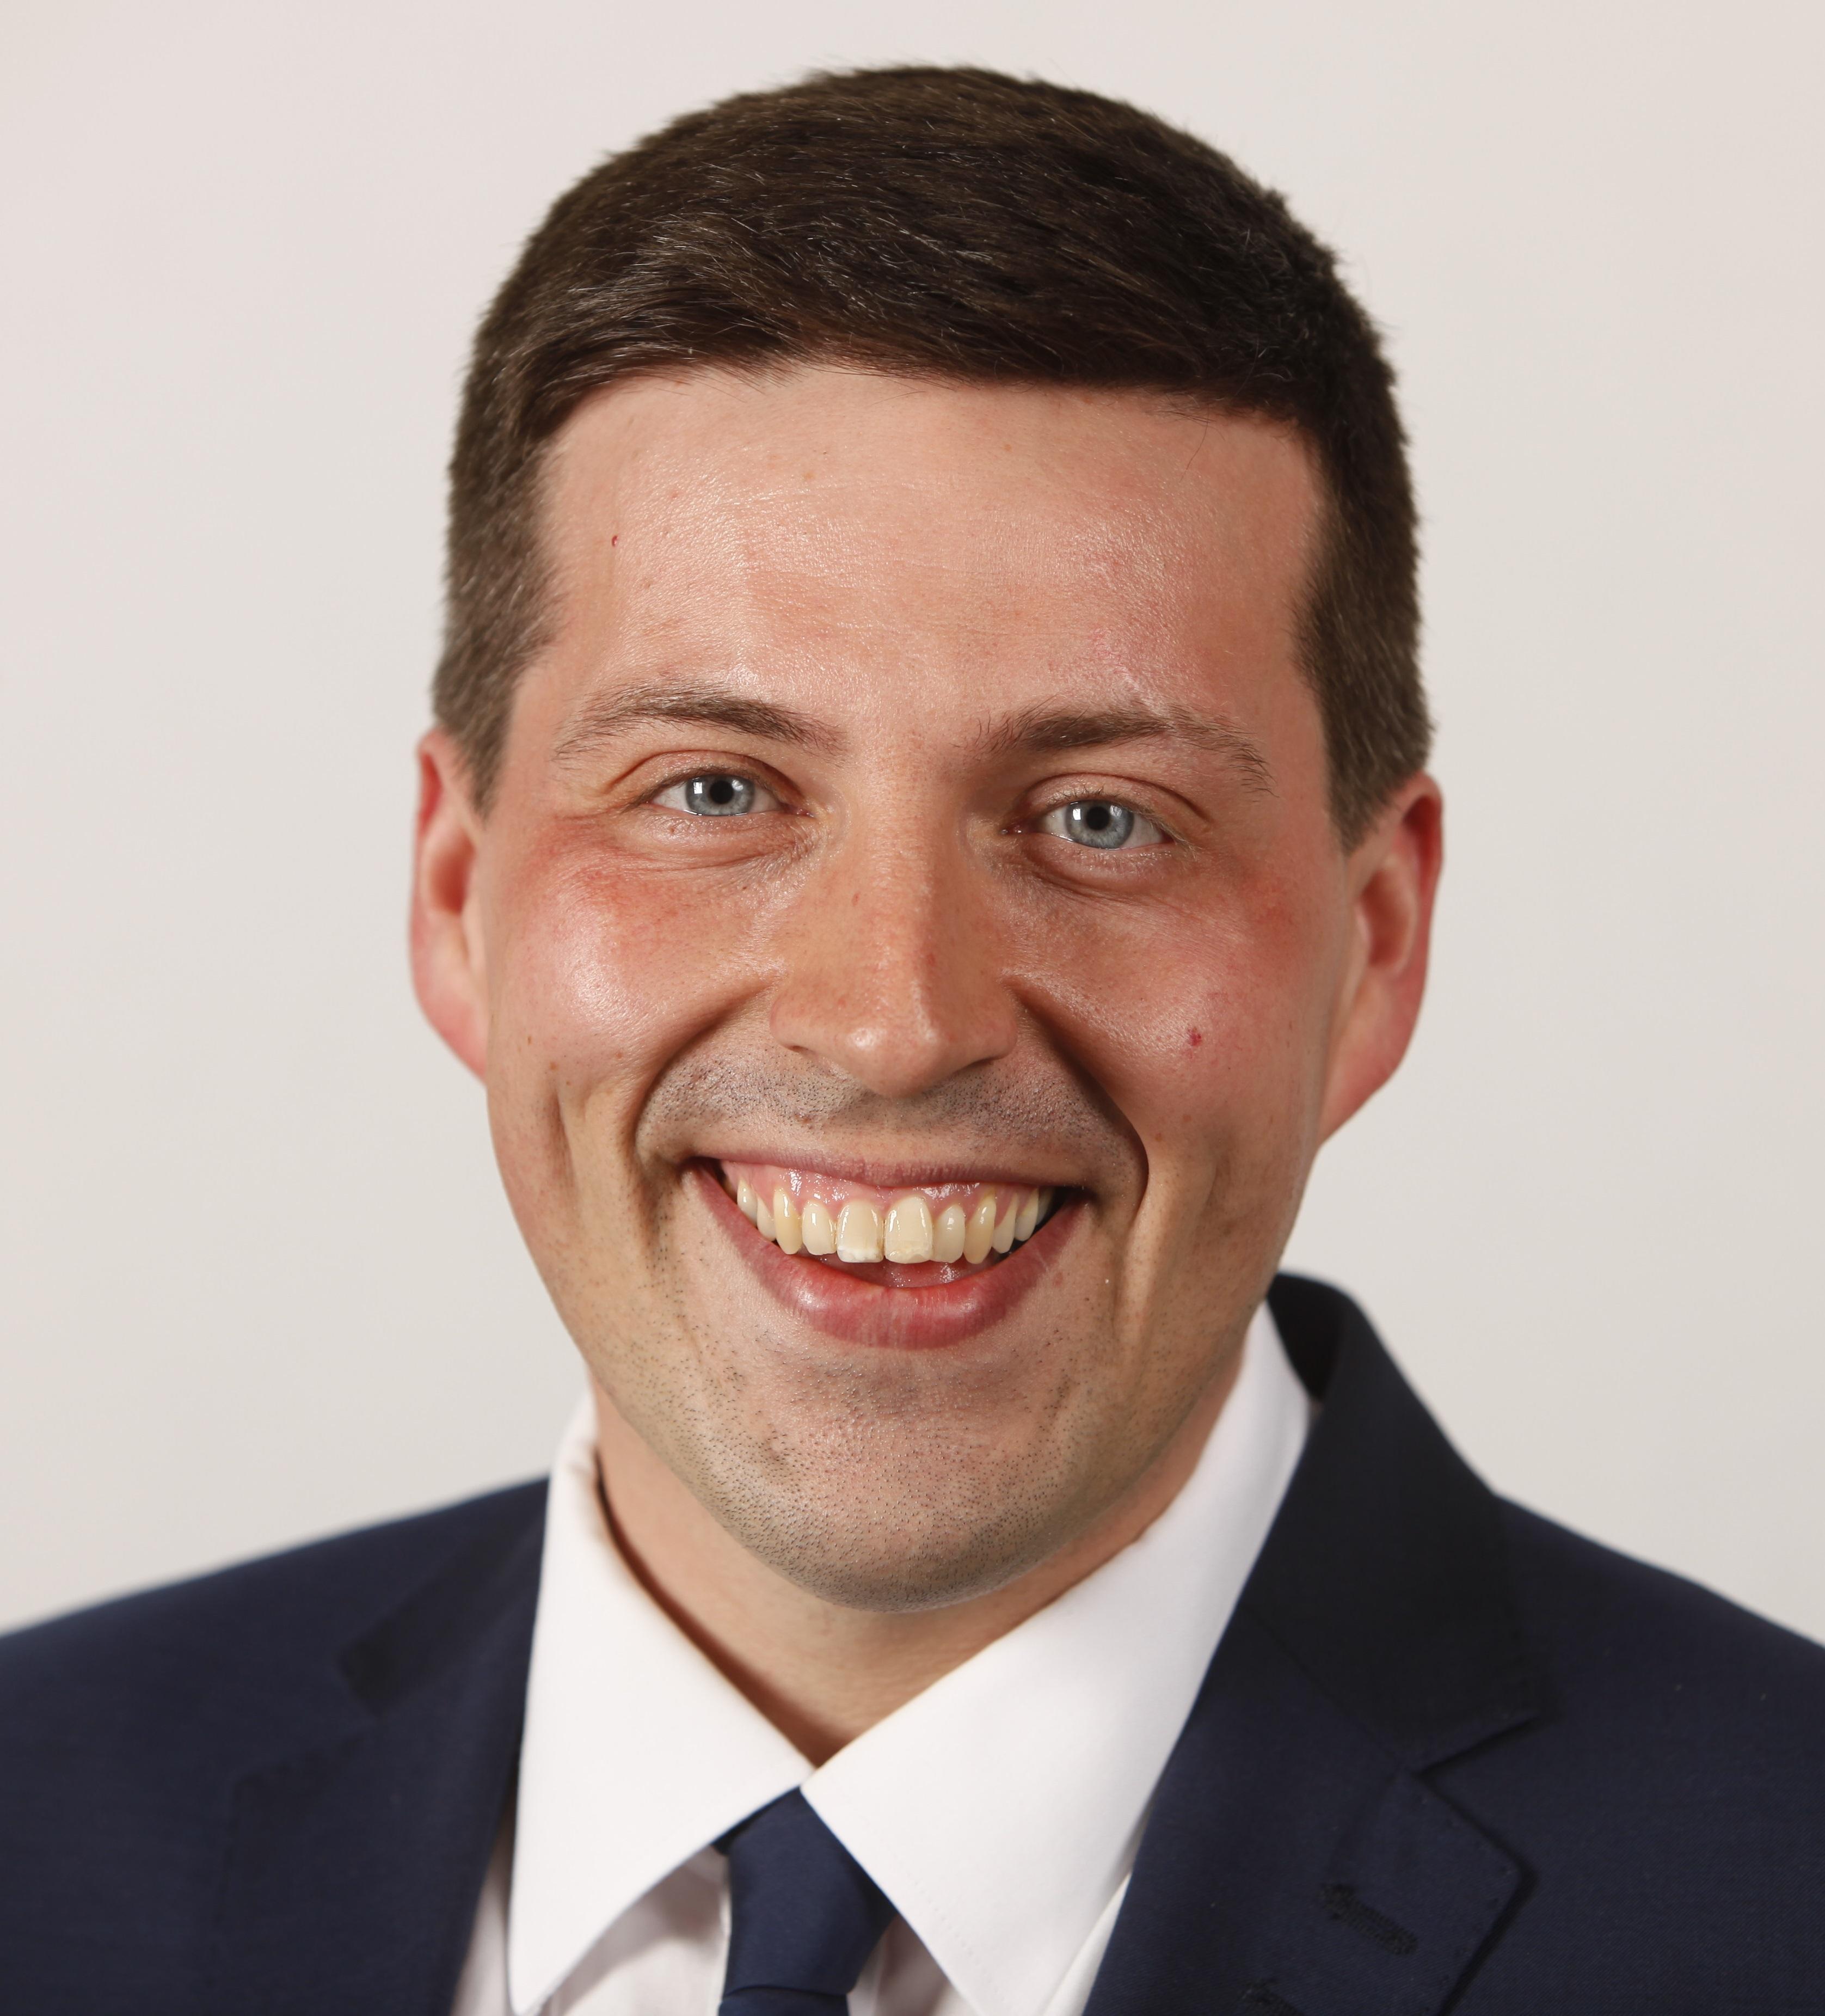 Jamie Hepburn - SNP - Cumbernauld and Kilsyth May 2016. Pic - Andrew Cowan/Scottish Parliament